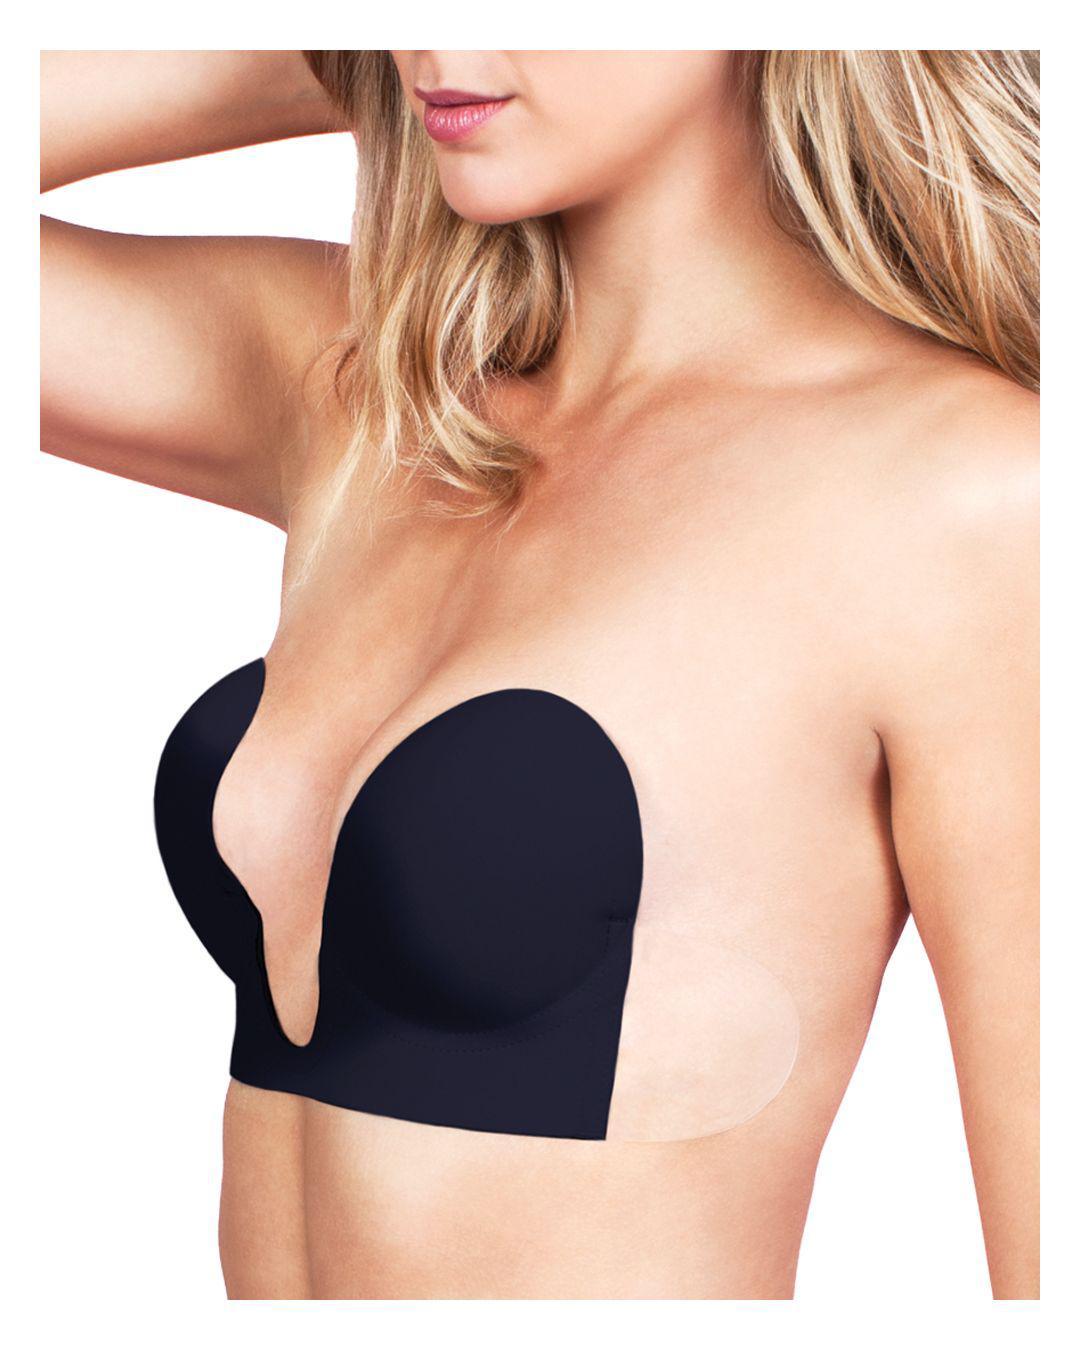 5915826bfac Fashion Forms Backless U-plunge Strapless Bra in Black - Lyst